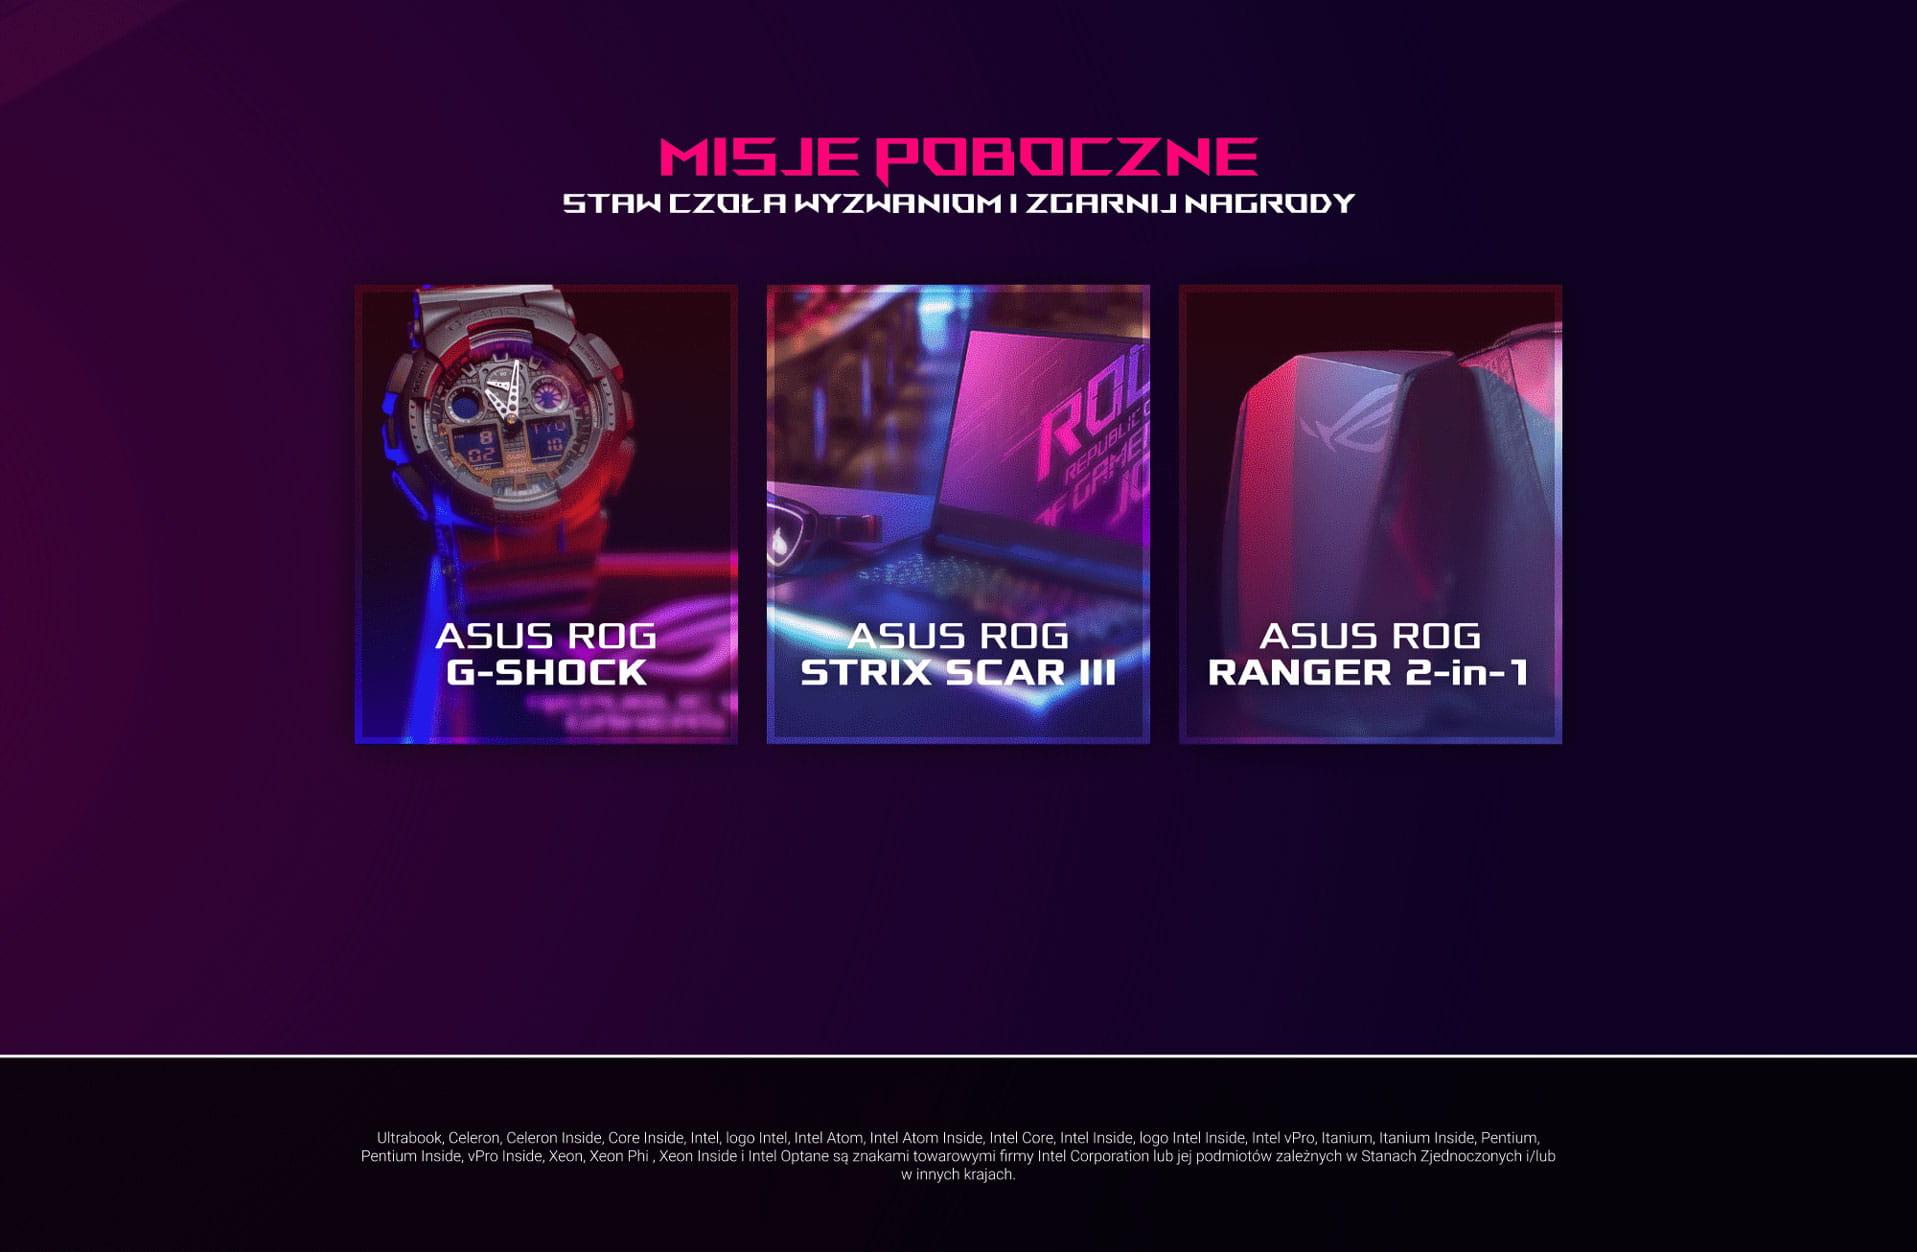 Nagrody misji pobocznych ASUS ROG G-SHOCK ASUS ROG Strix Scar III ASUS ROG RANGER 2-in-1